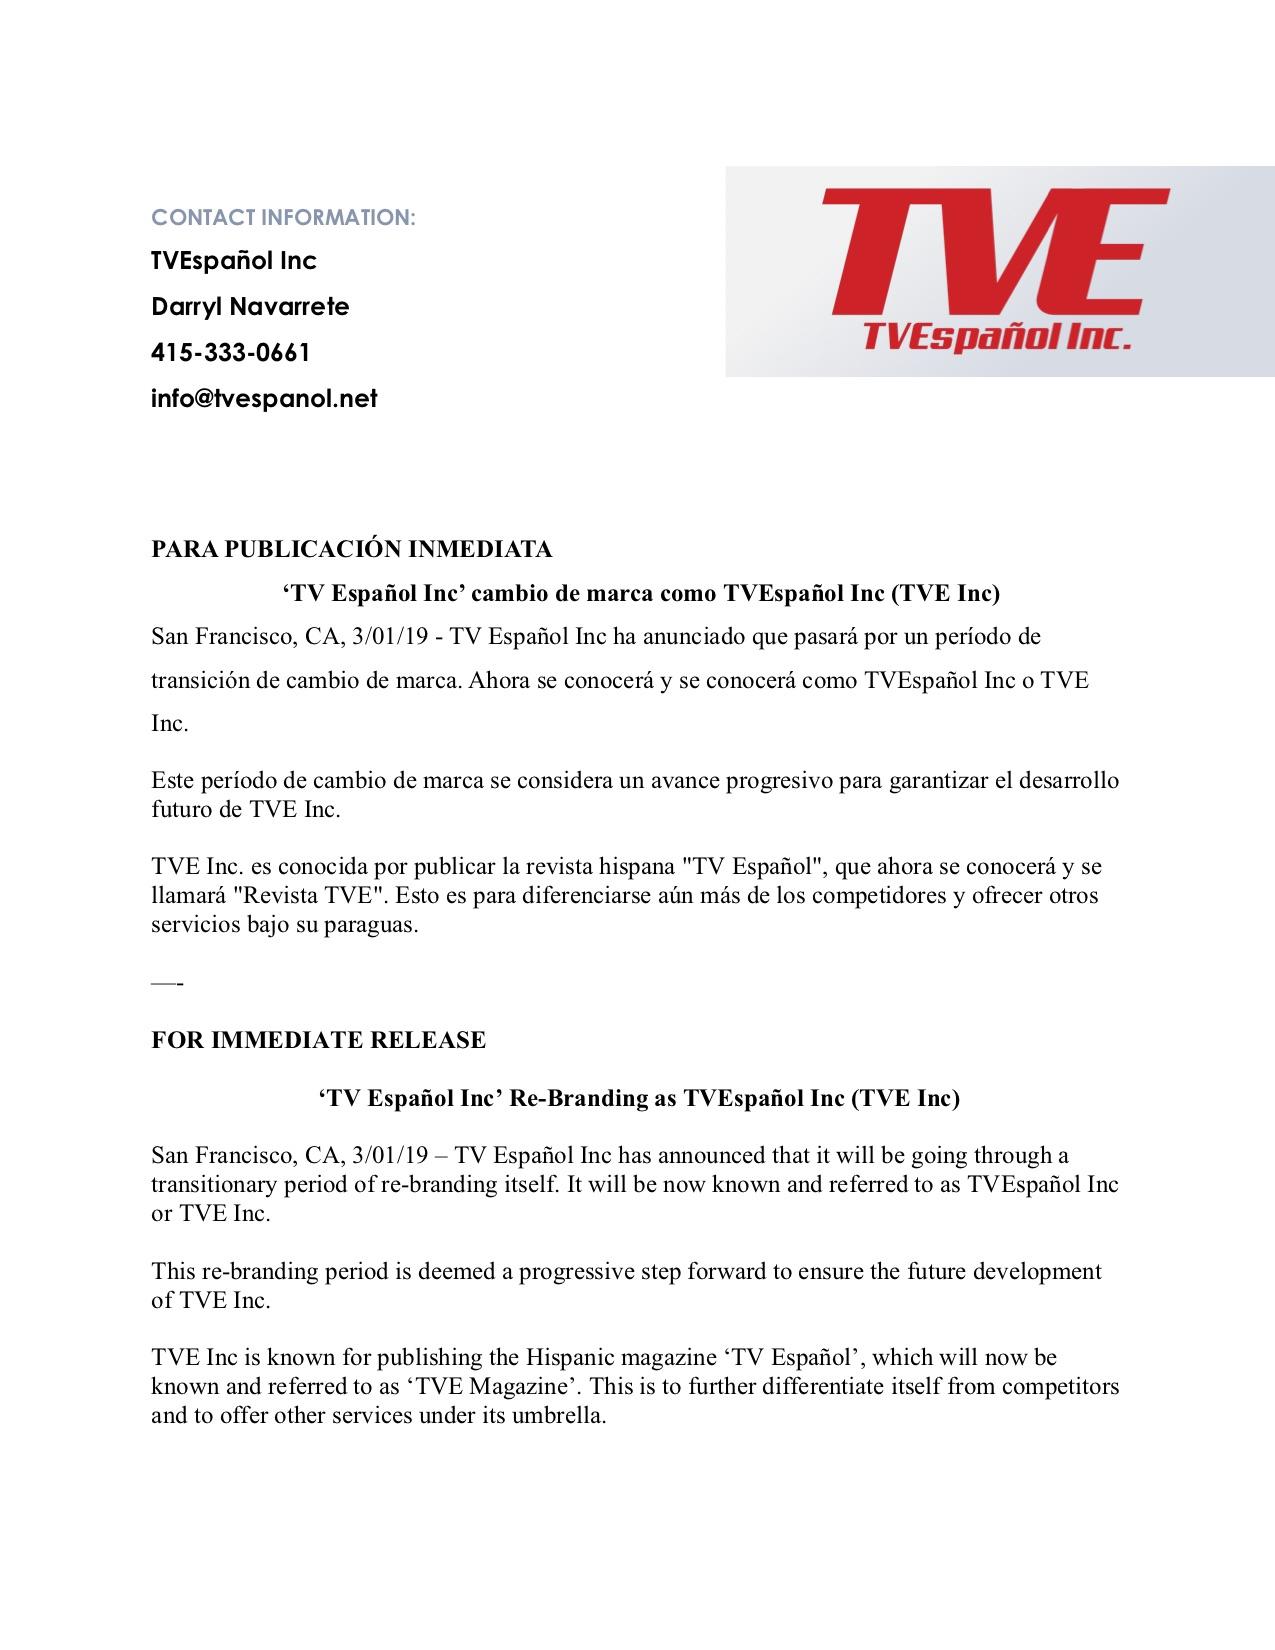 TVE Re-Brand Press Release.jpg